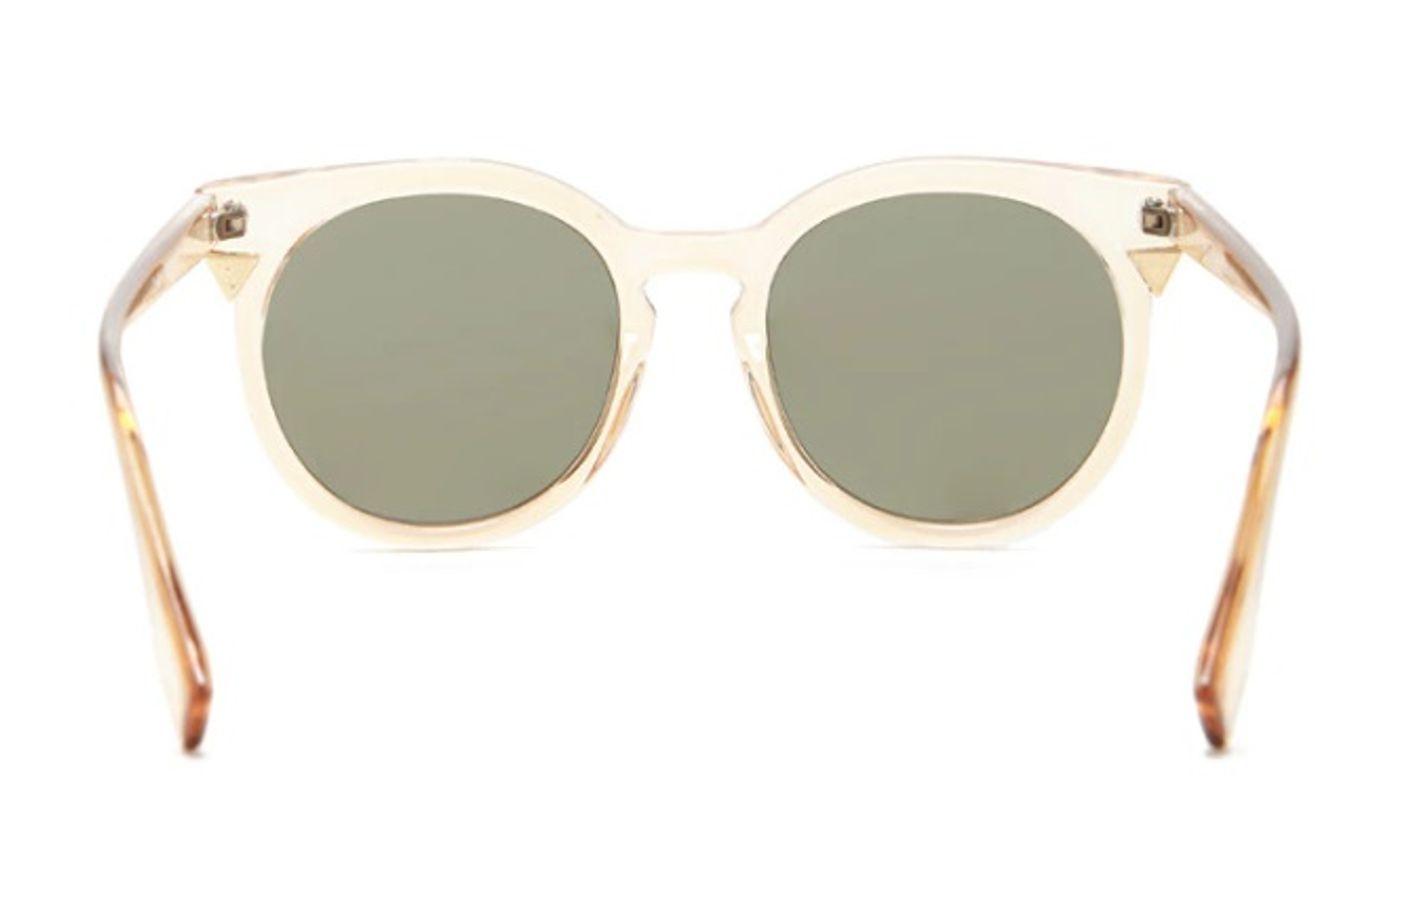 Kính Mắt F21 Sheer Round Sunglasses 1000214119